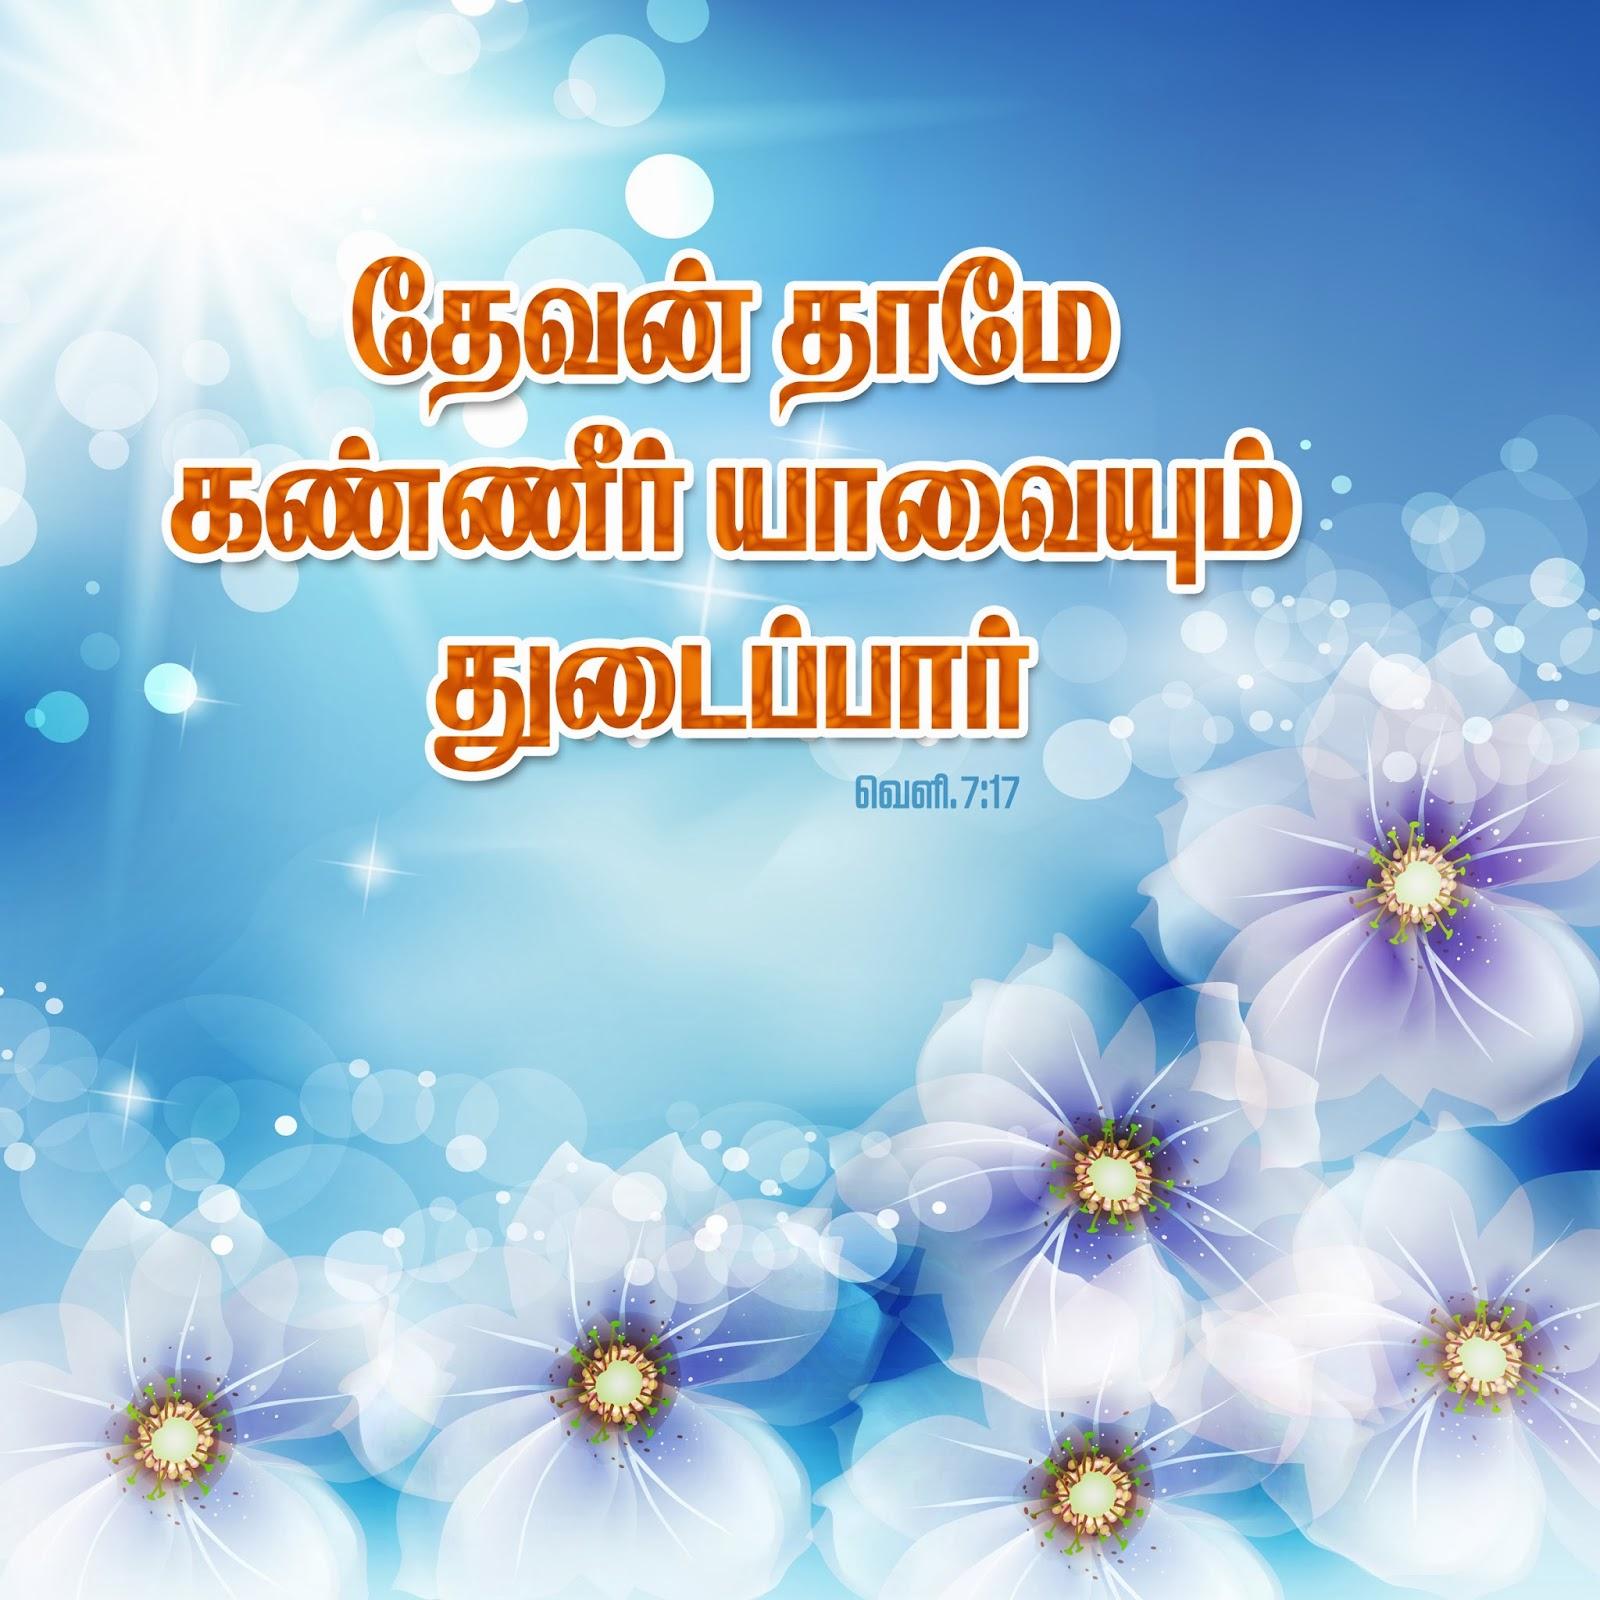 Images Of Tamil Bible Verse Wallpaper Spacehero